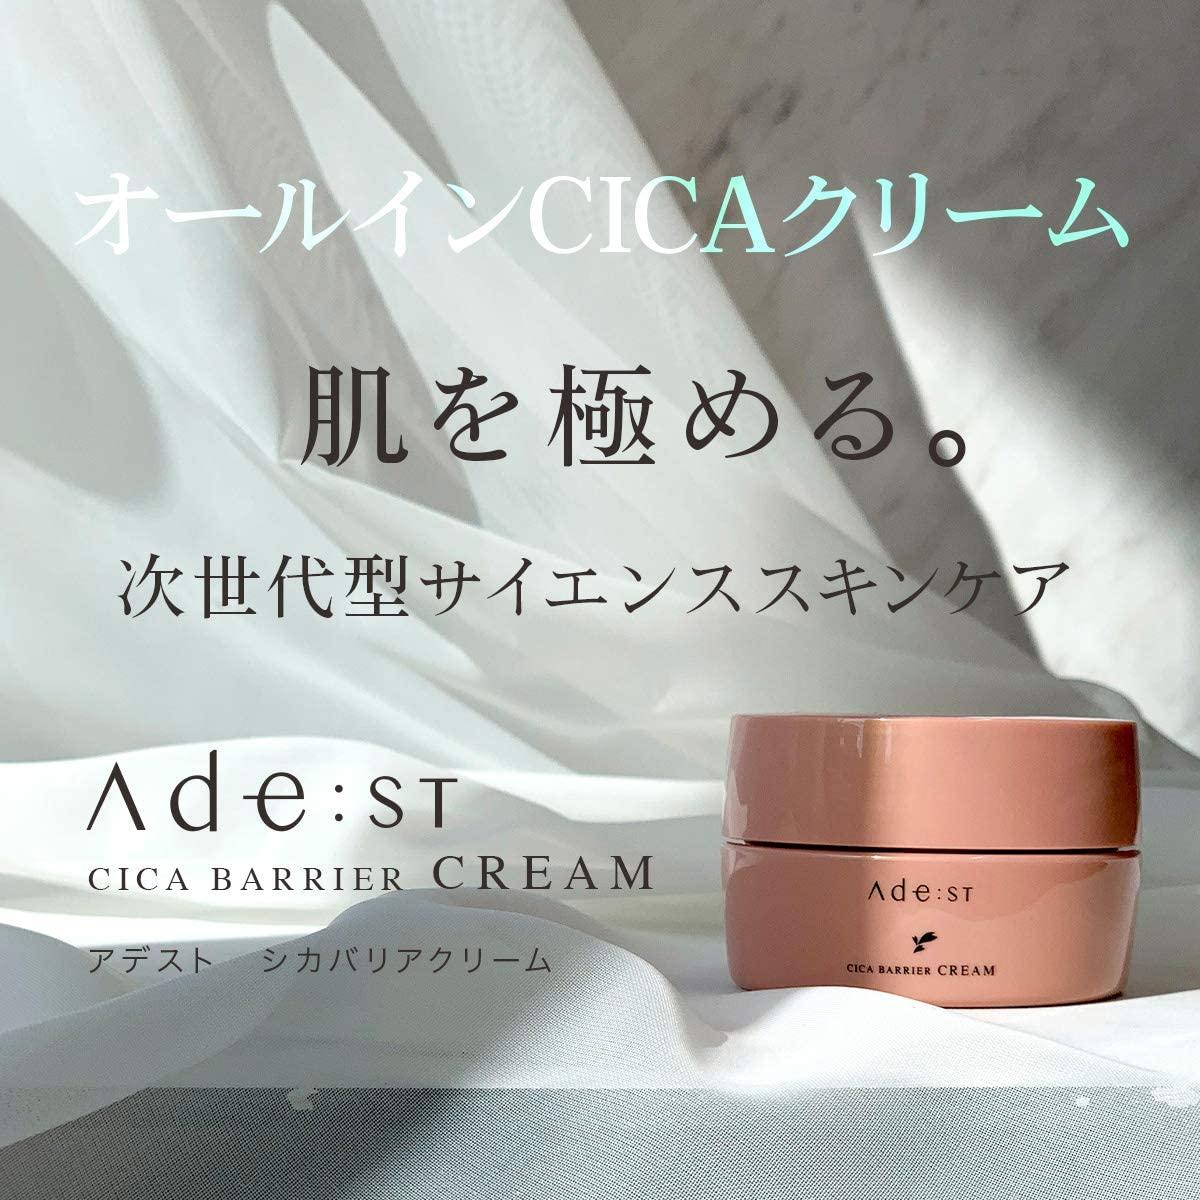 Ade:ST CICA BARRIER CREAM シカクリーム